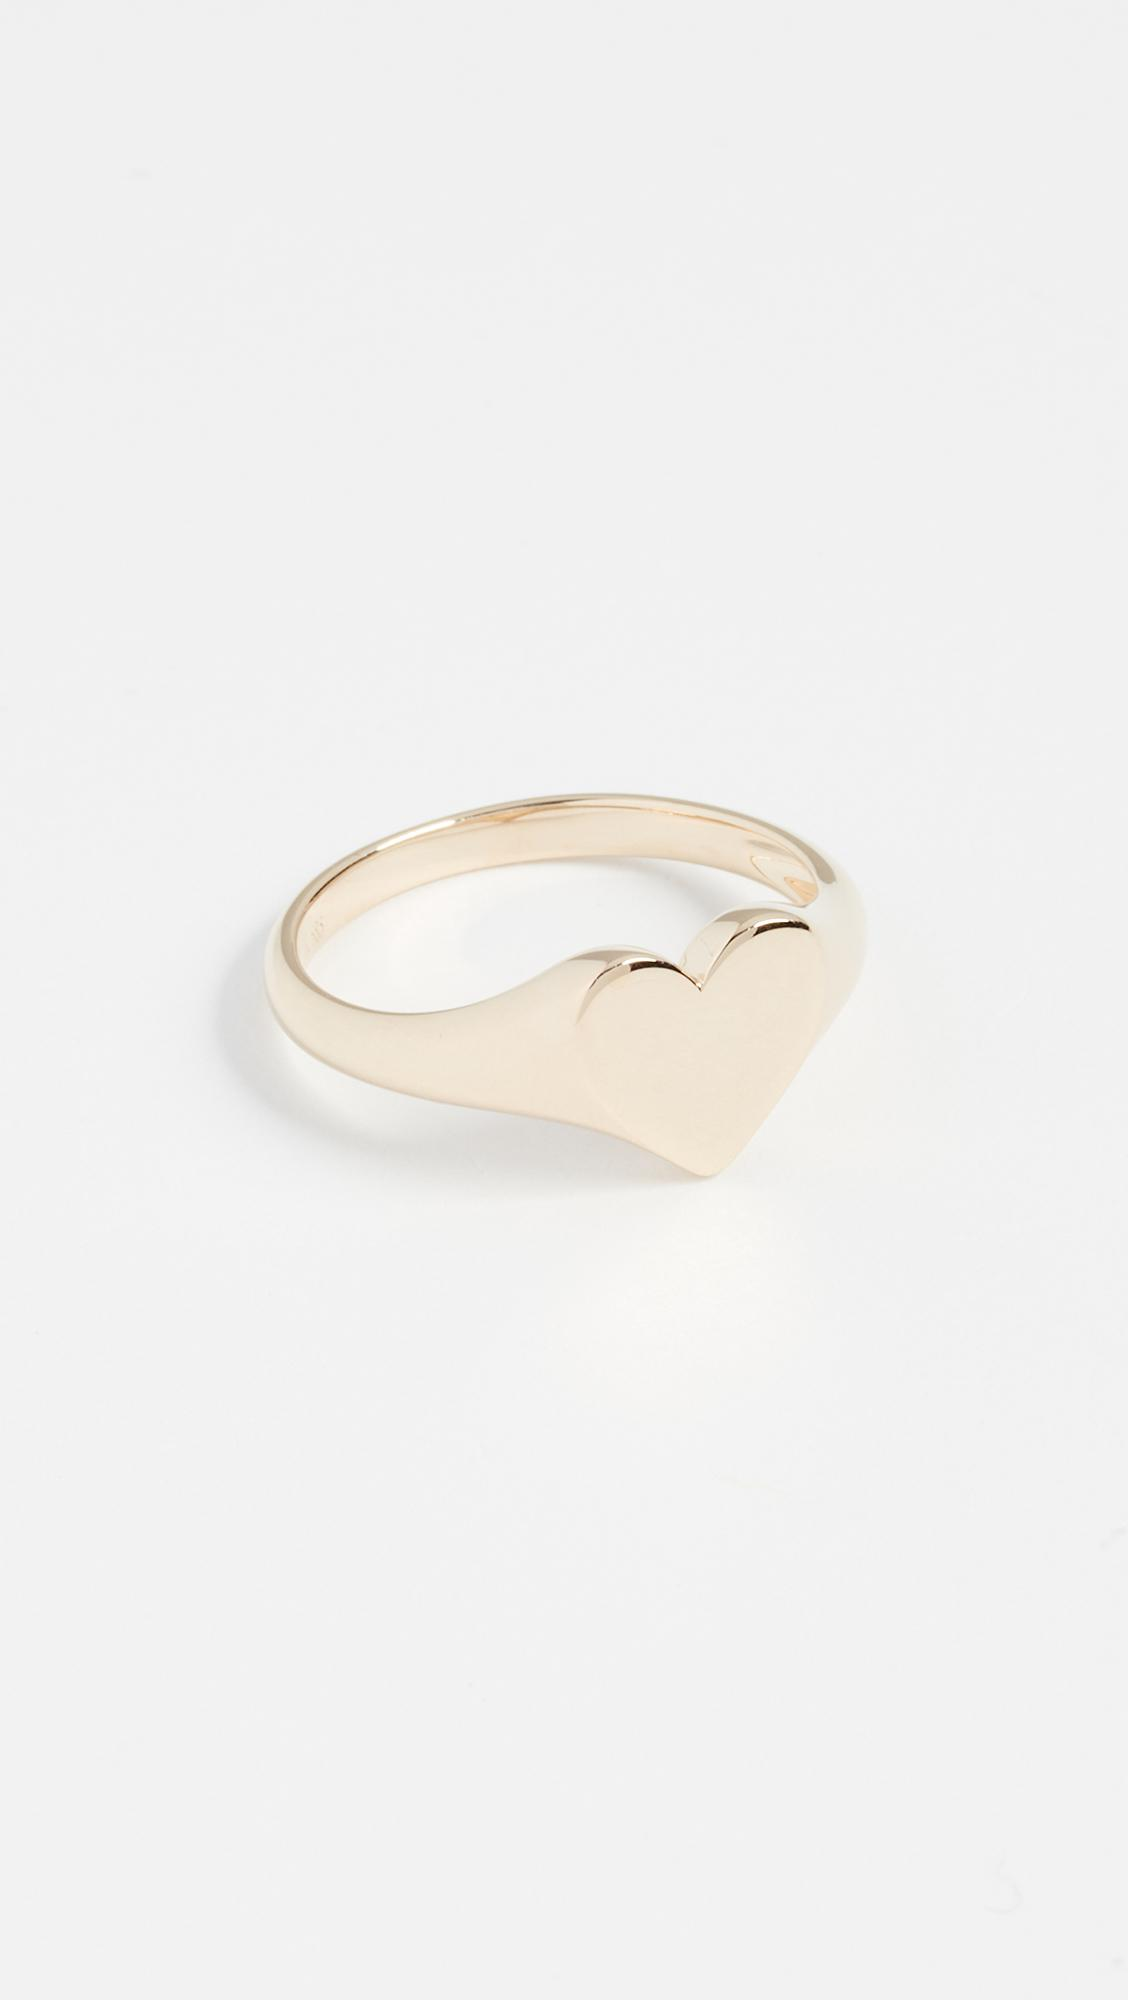 EF Collection 14K Gold Heart Signet Ring 7slXg5cqFG